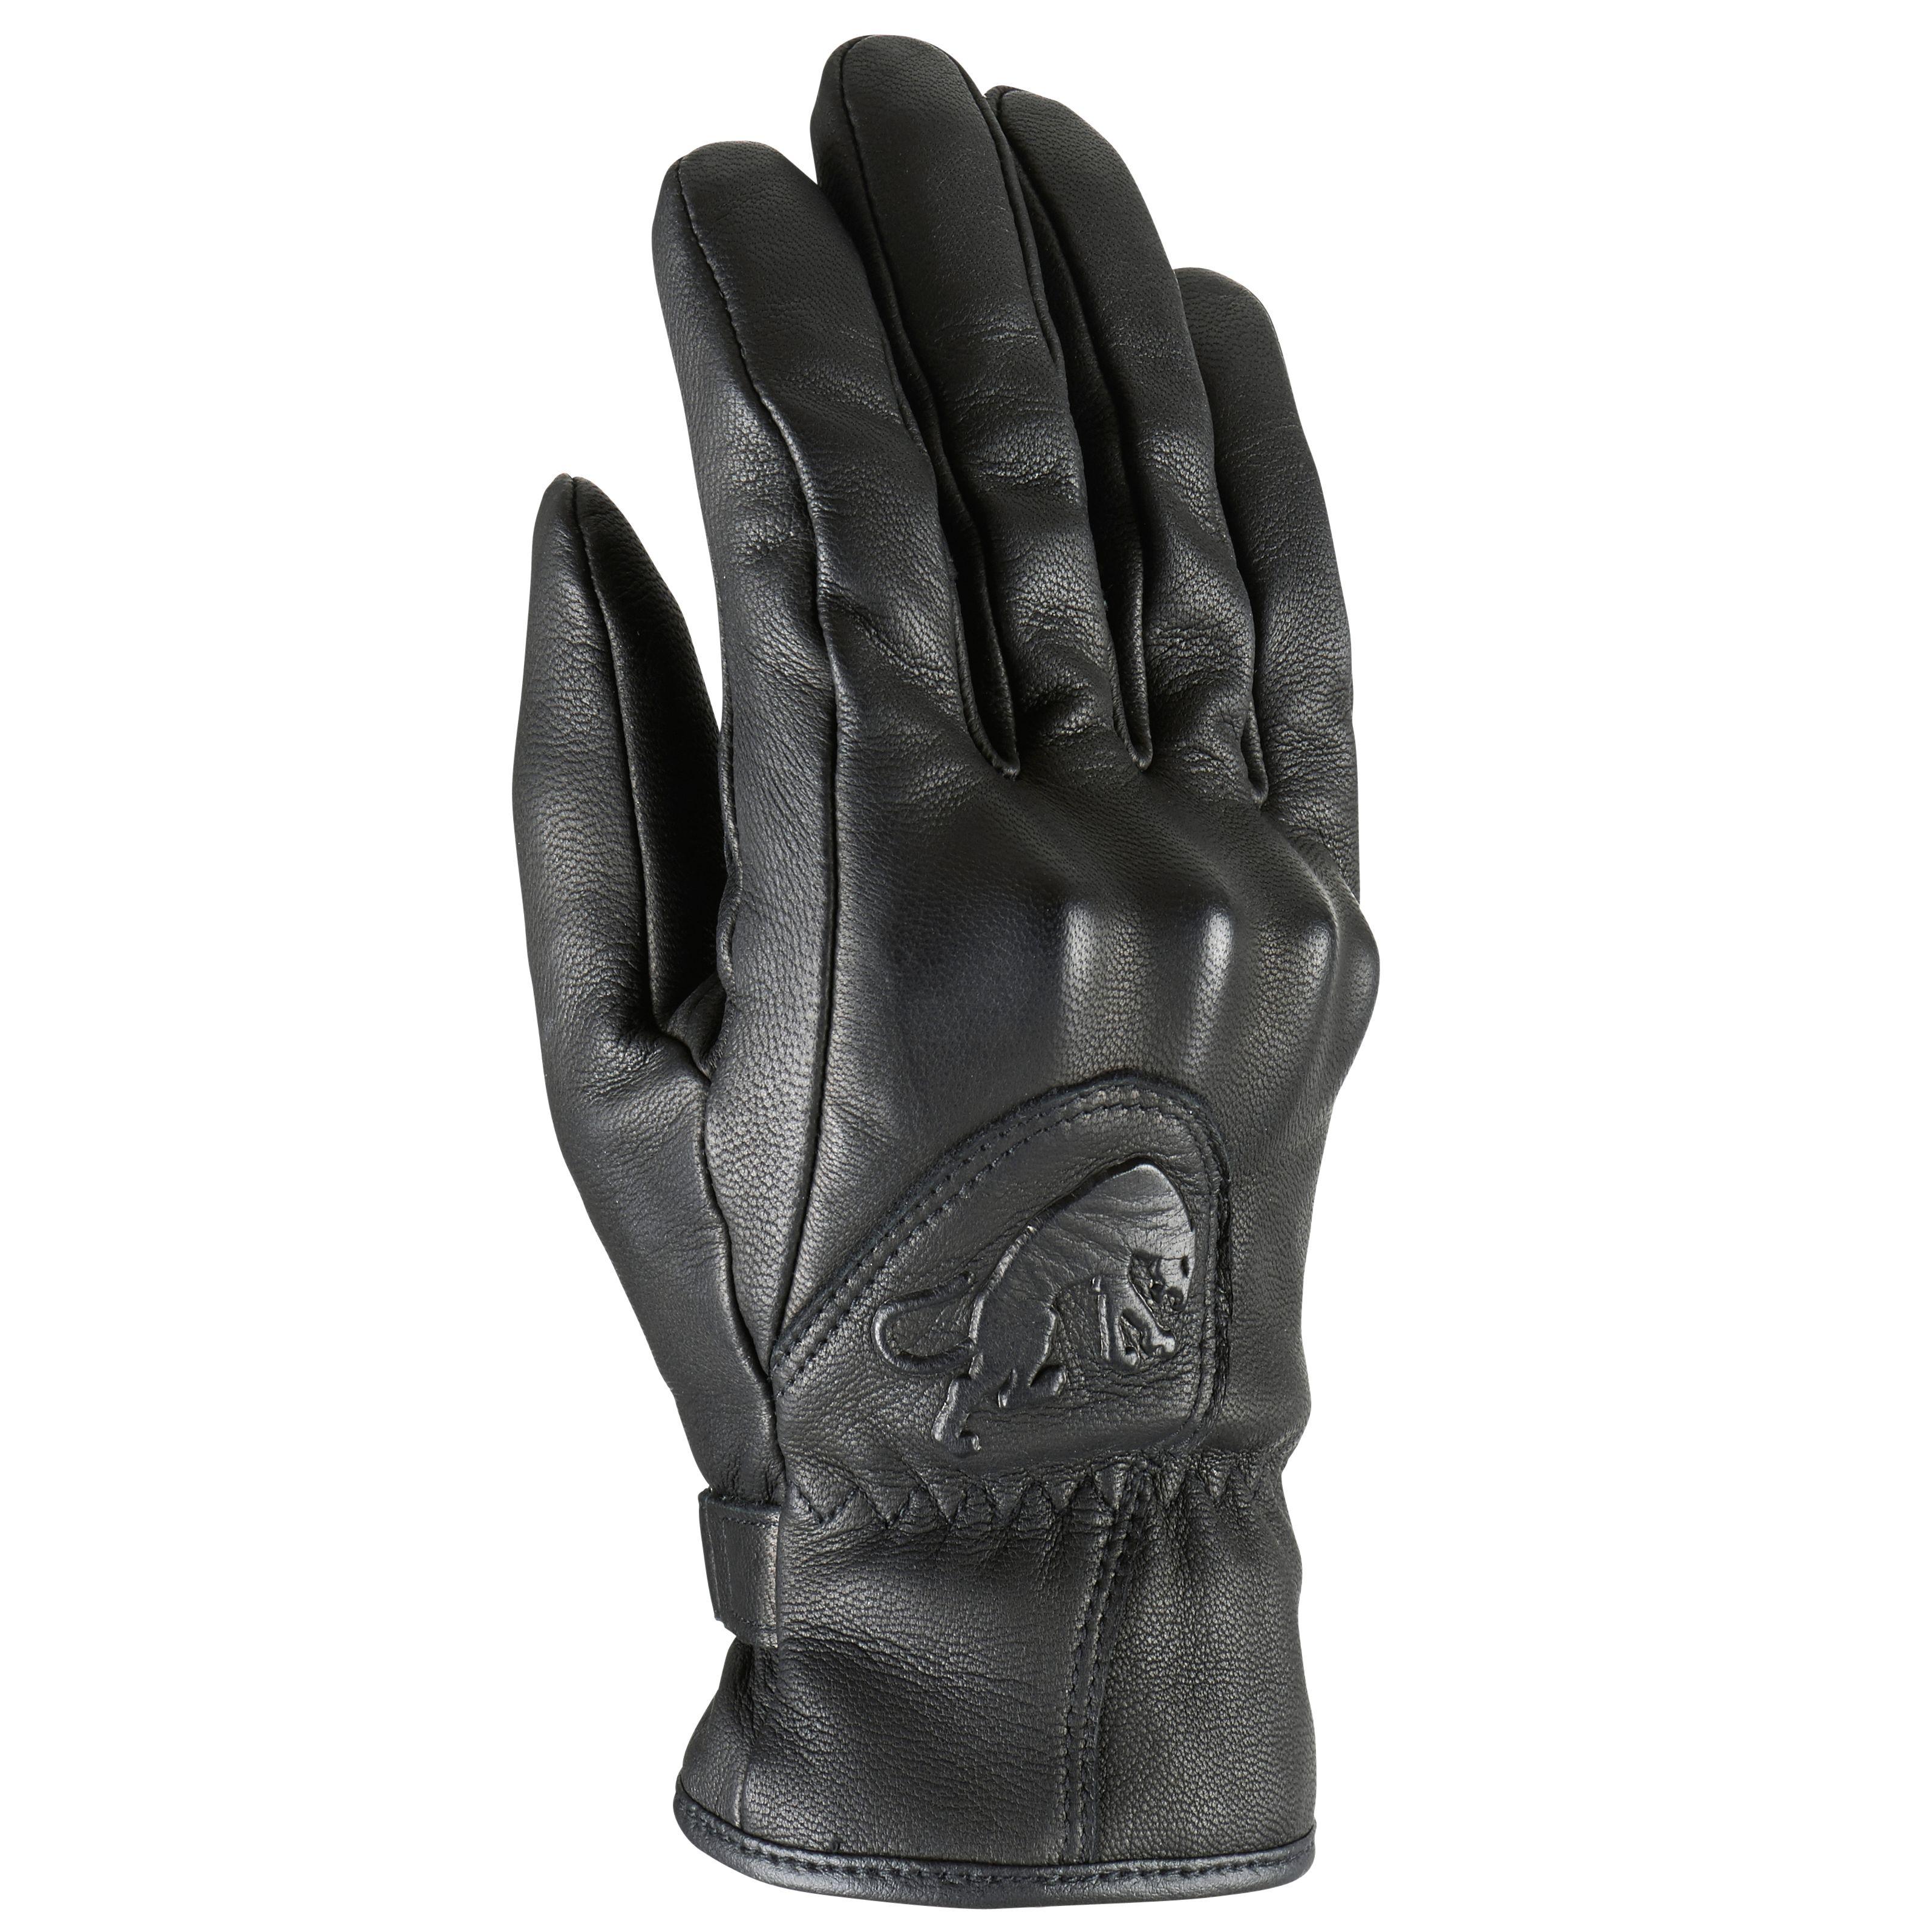 gants hiver en cuir furygan gr all seasons s team motos. Black Bedroom Furniture Sets. Home Design Ideas